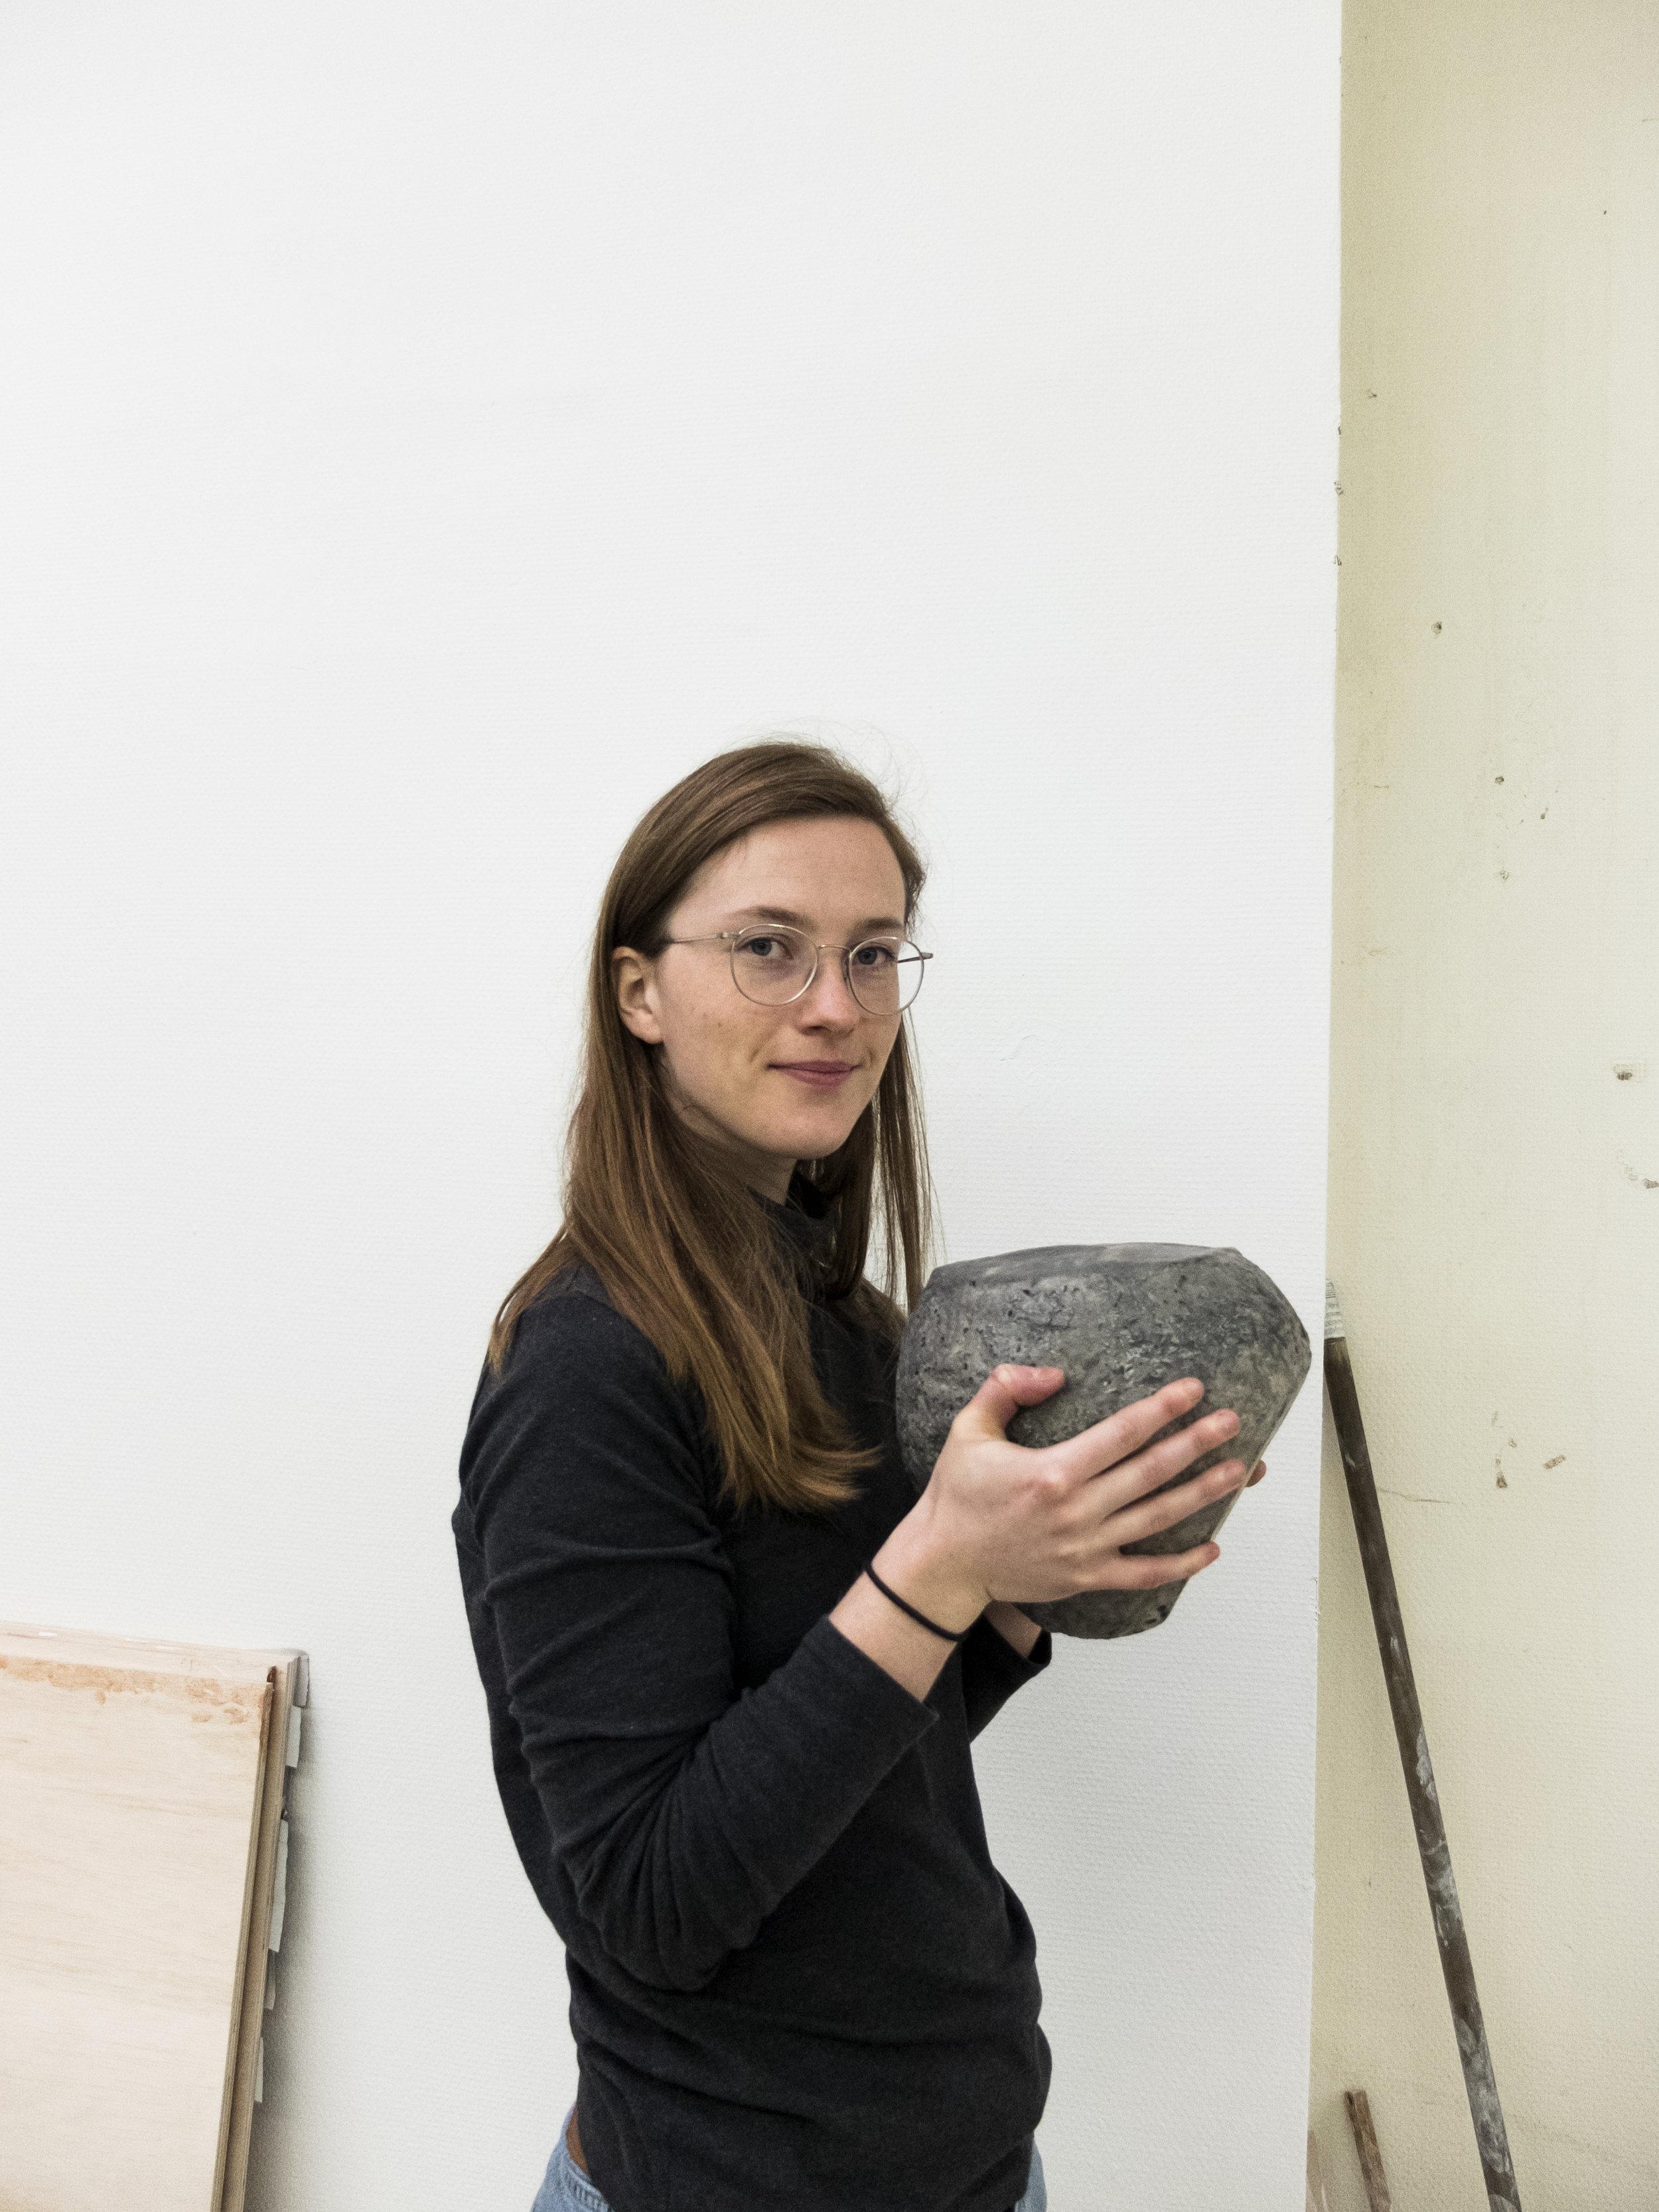 Ljósmynd: Ligia Poplawska (tók líka stúdíómyndina)